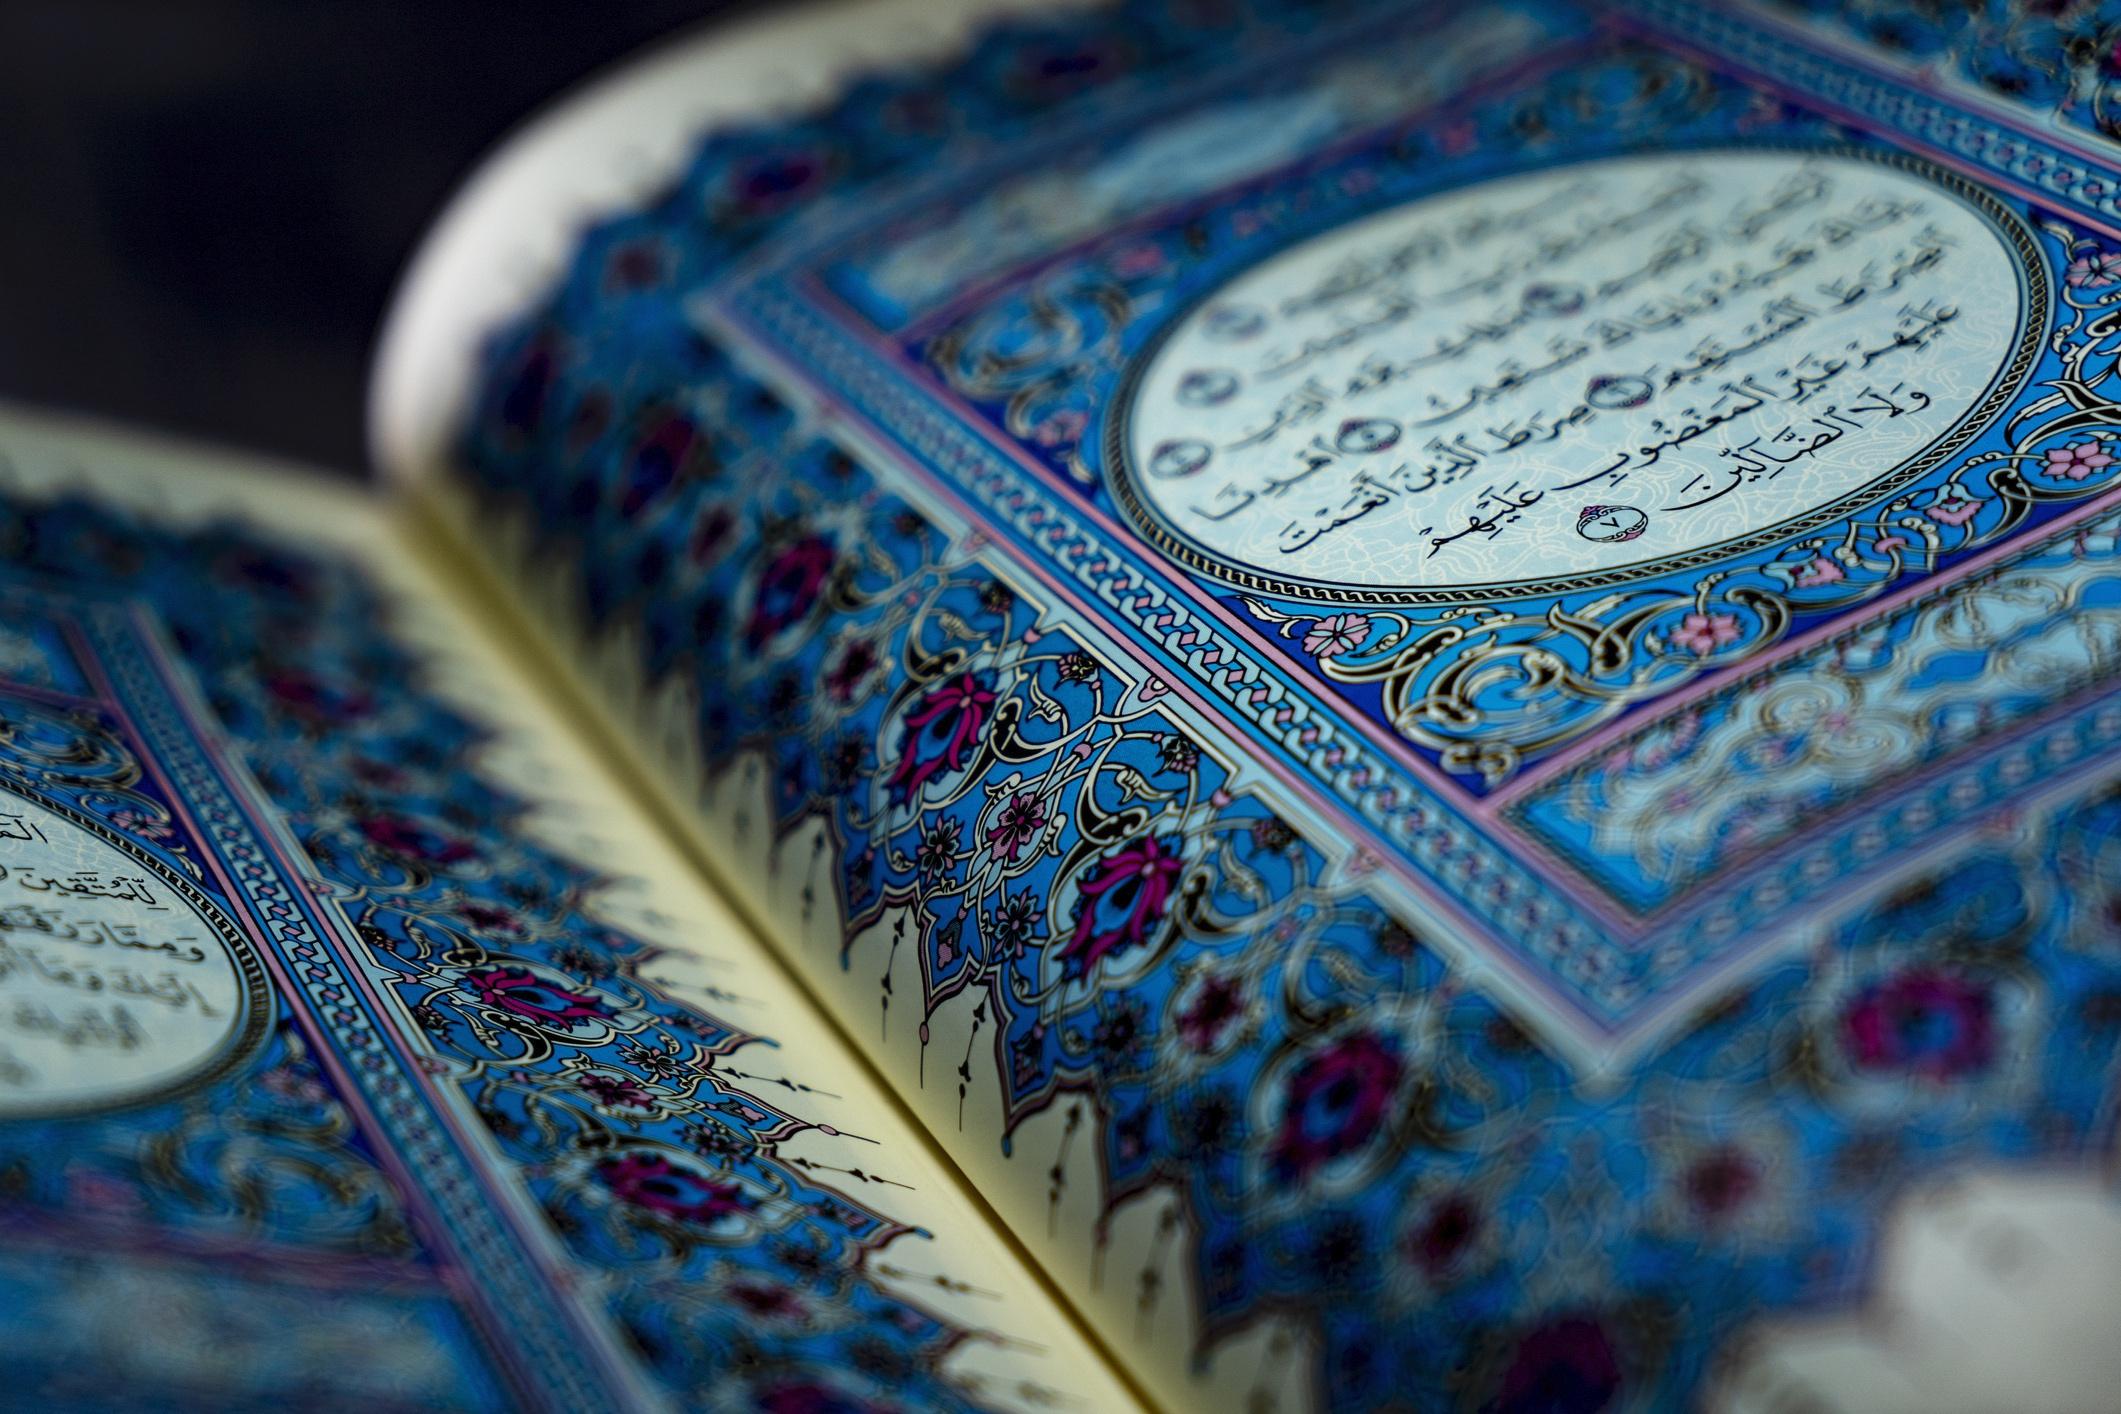 https://media.islamicity.org/wp-content/uploads/2020/04/iStock-1085351298.jpg